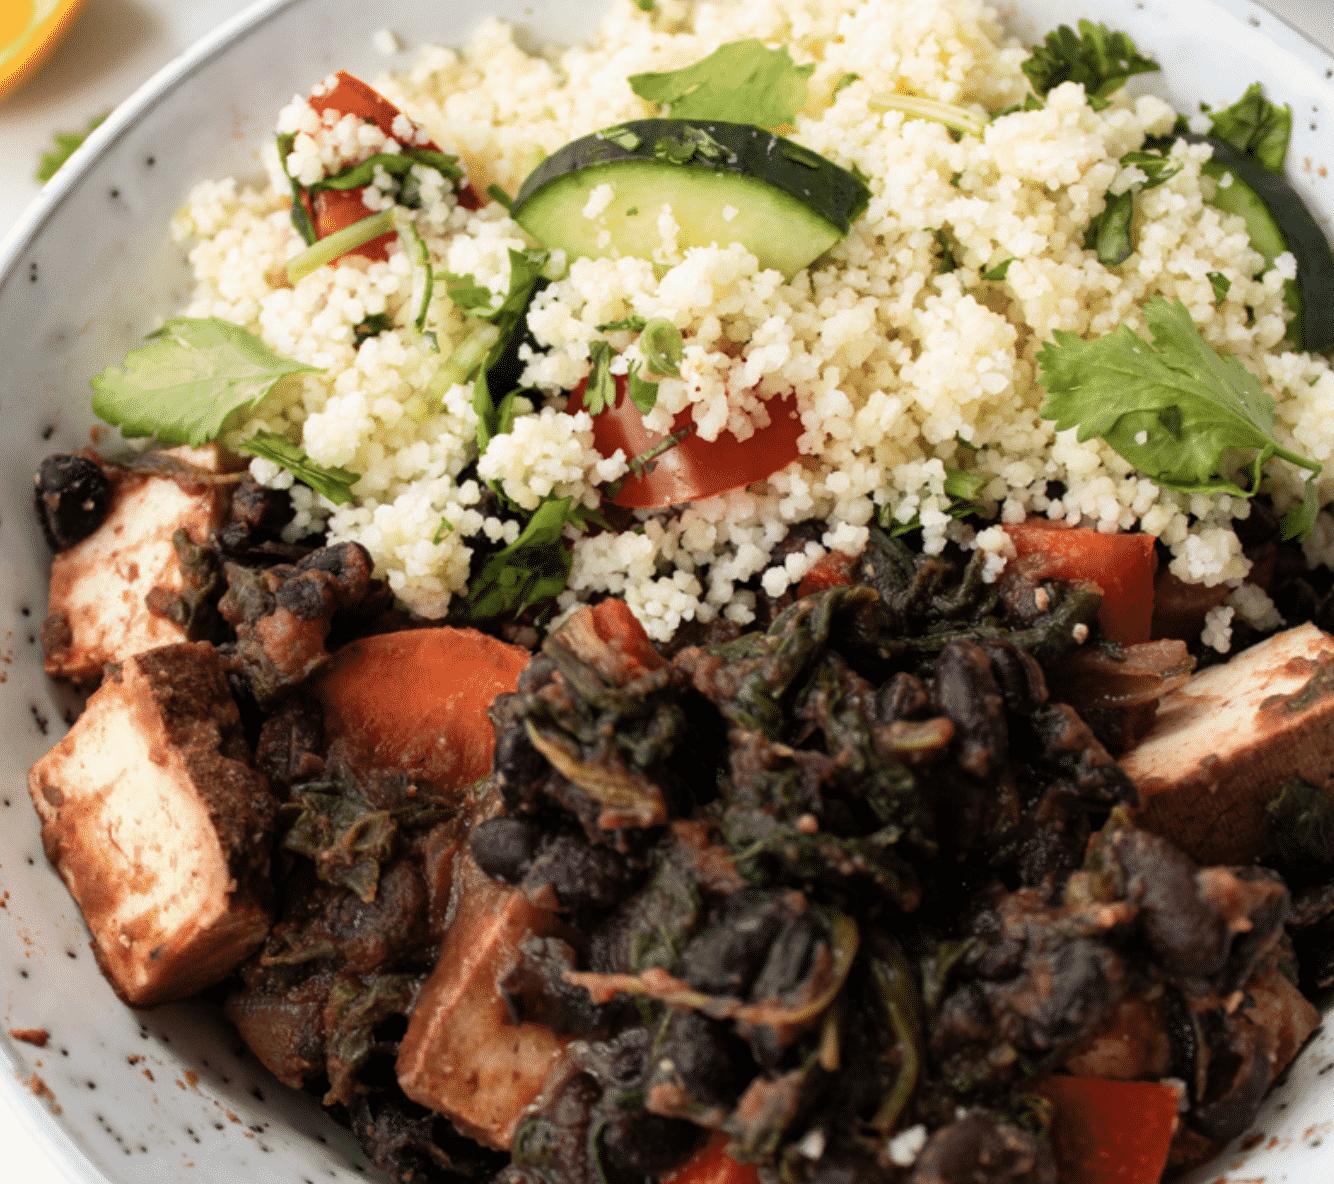 Best Vegan Dishes